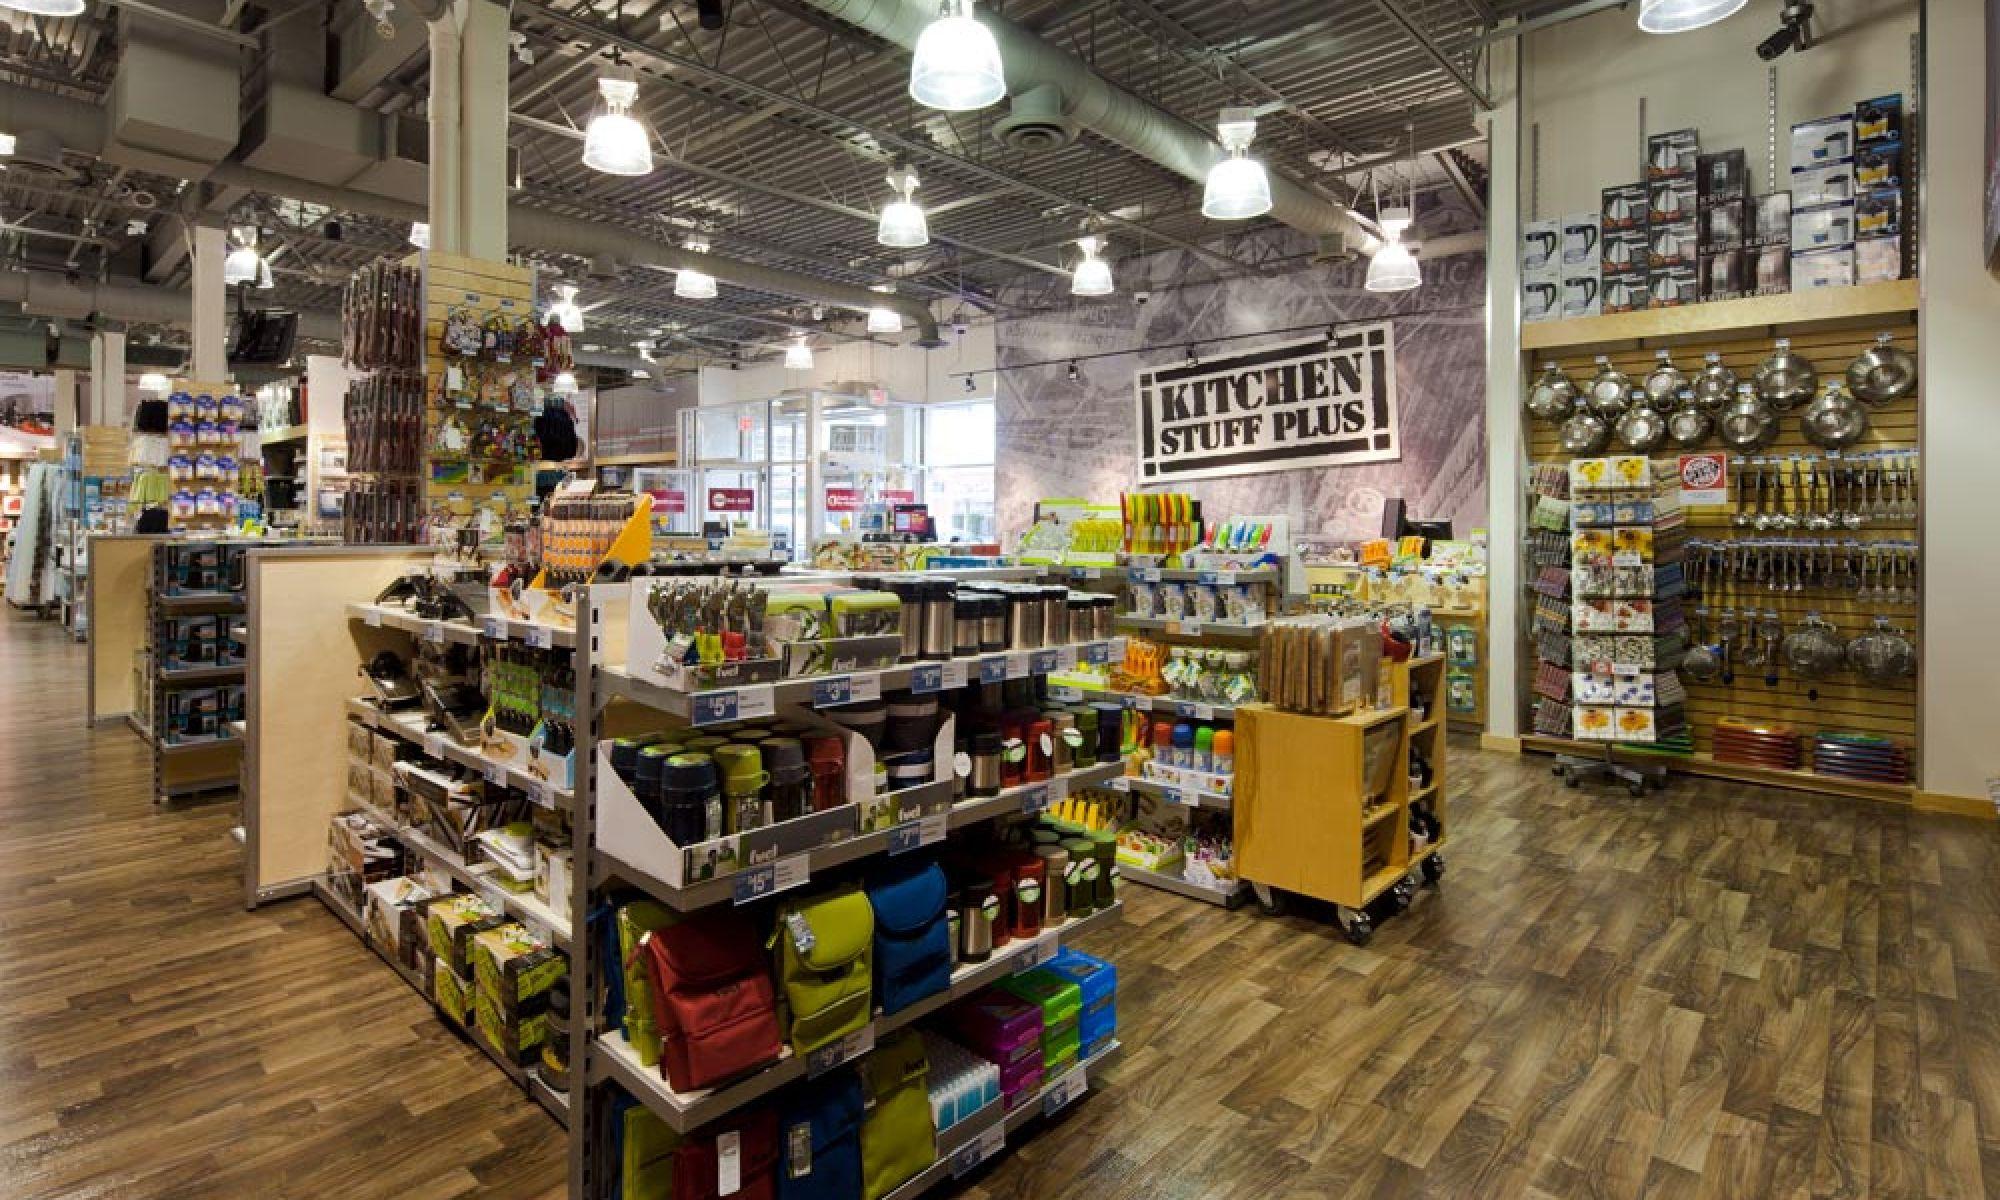 Kitchen Stuff Plus Is Having a Massive Warehouse Sale in ...